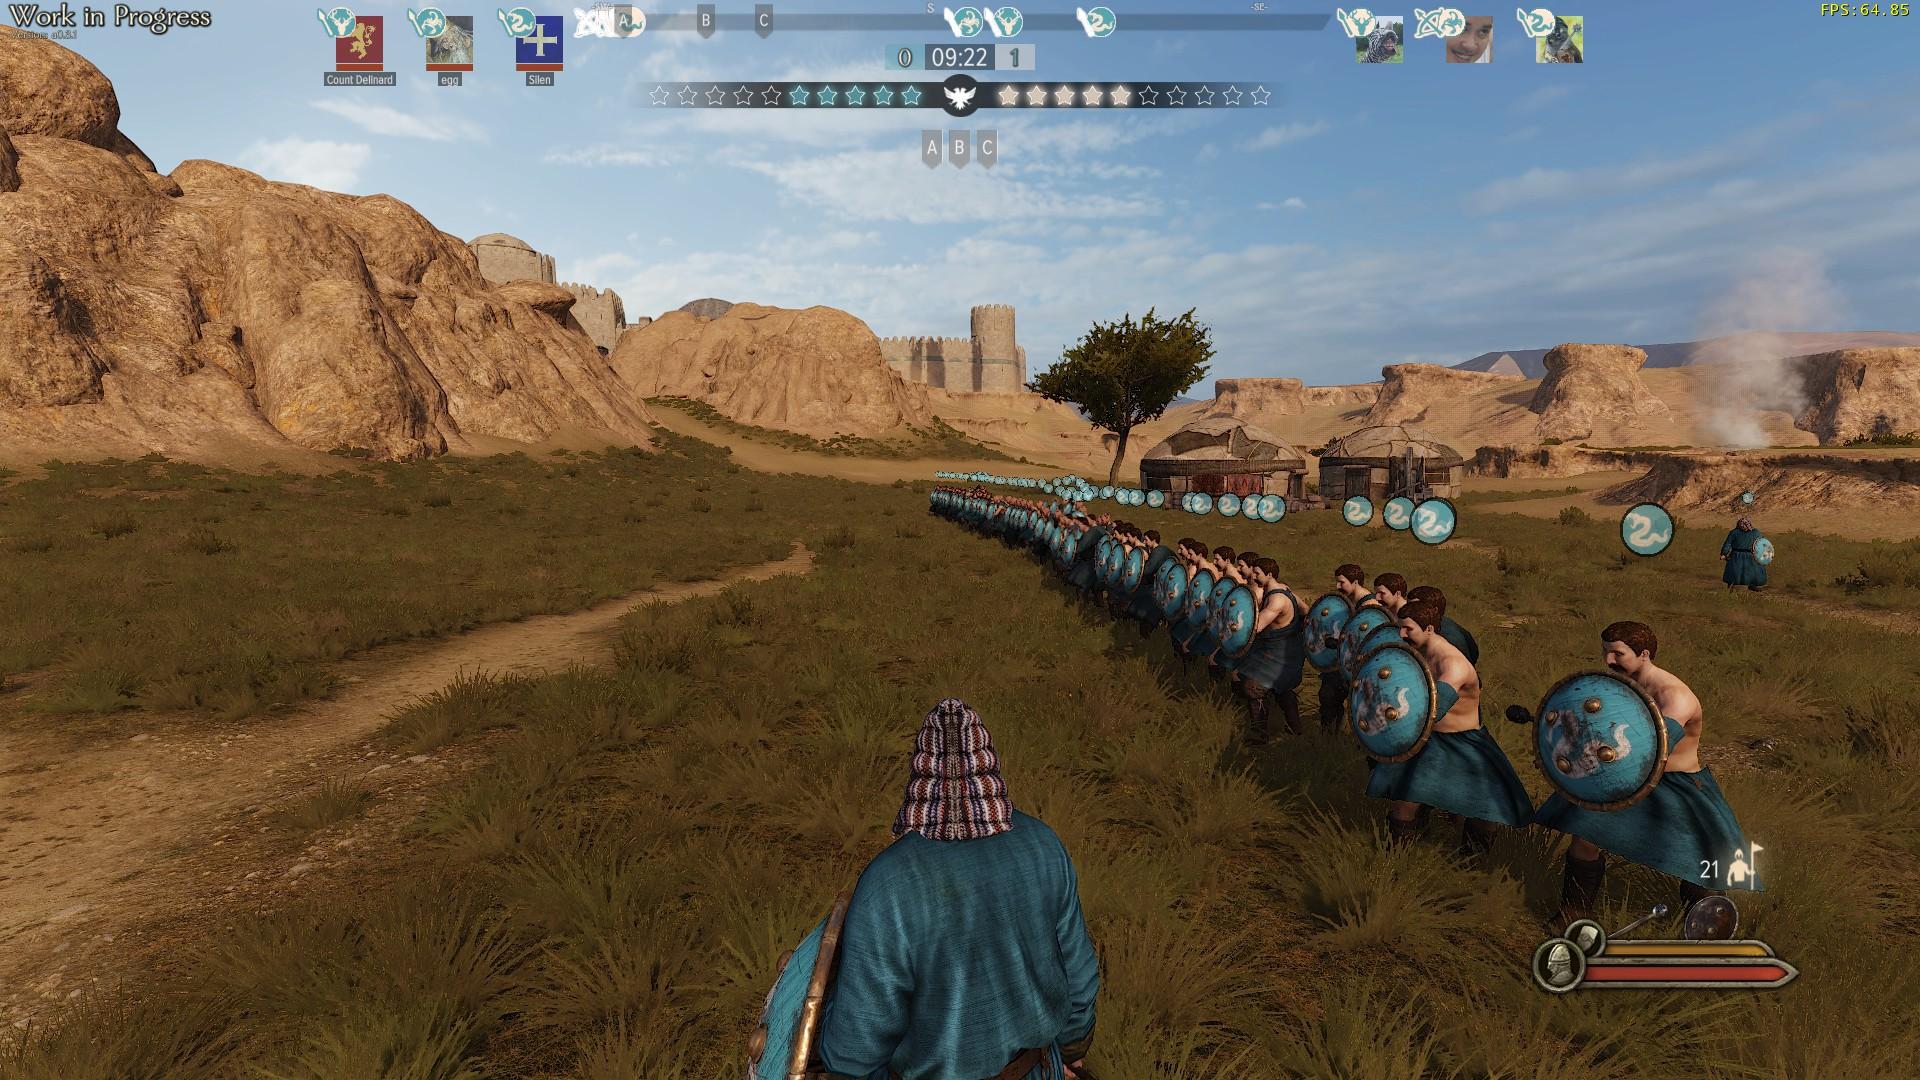 Gamescom 2019 - Cobertura Informativa 9kASf